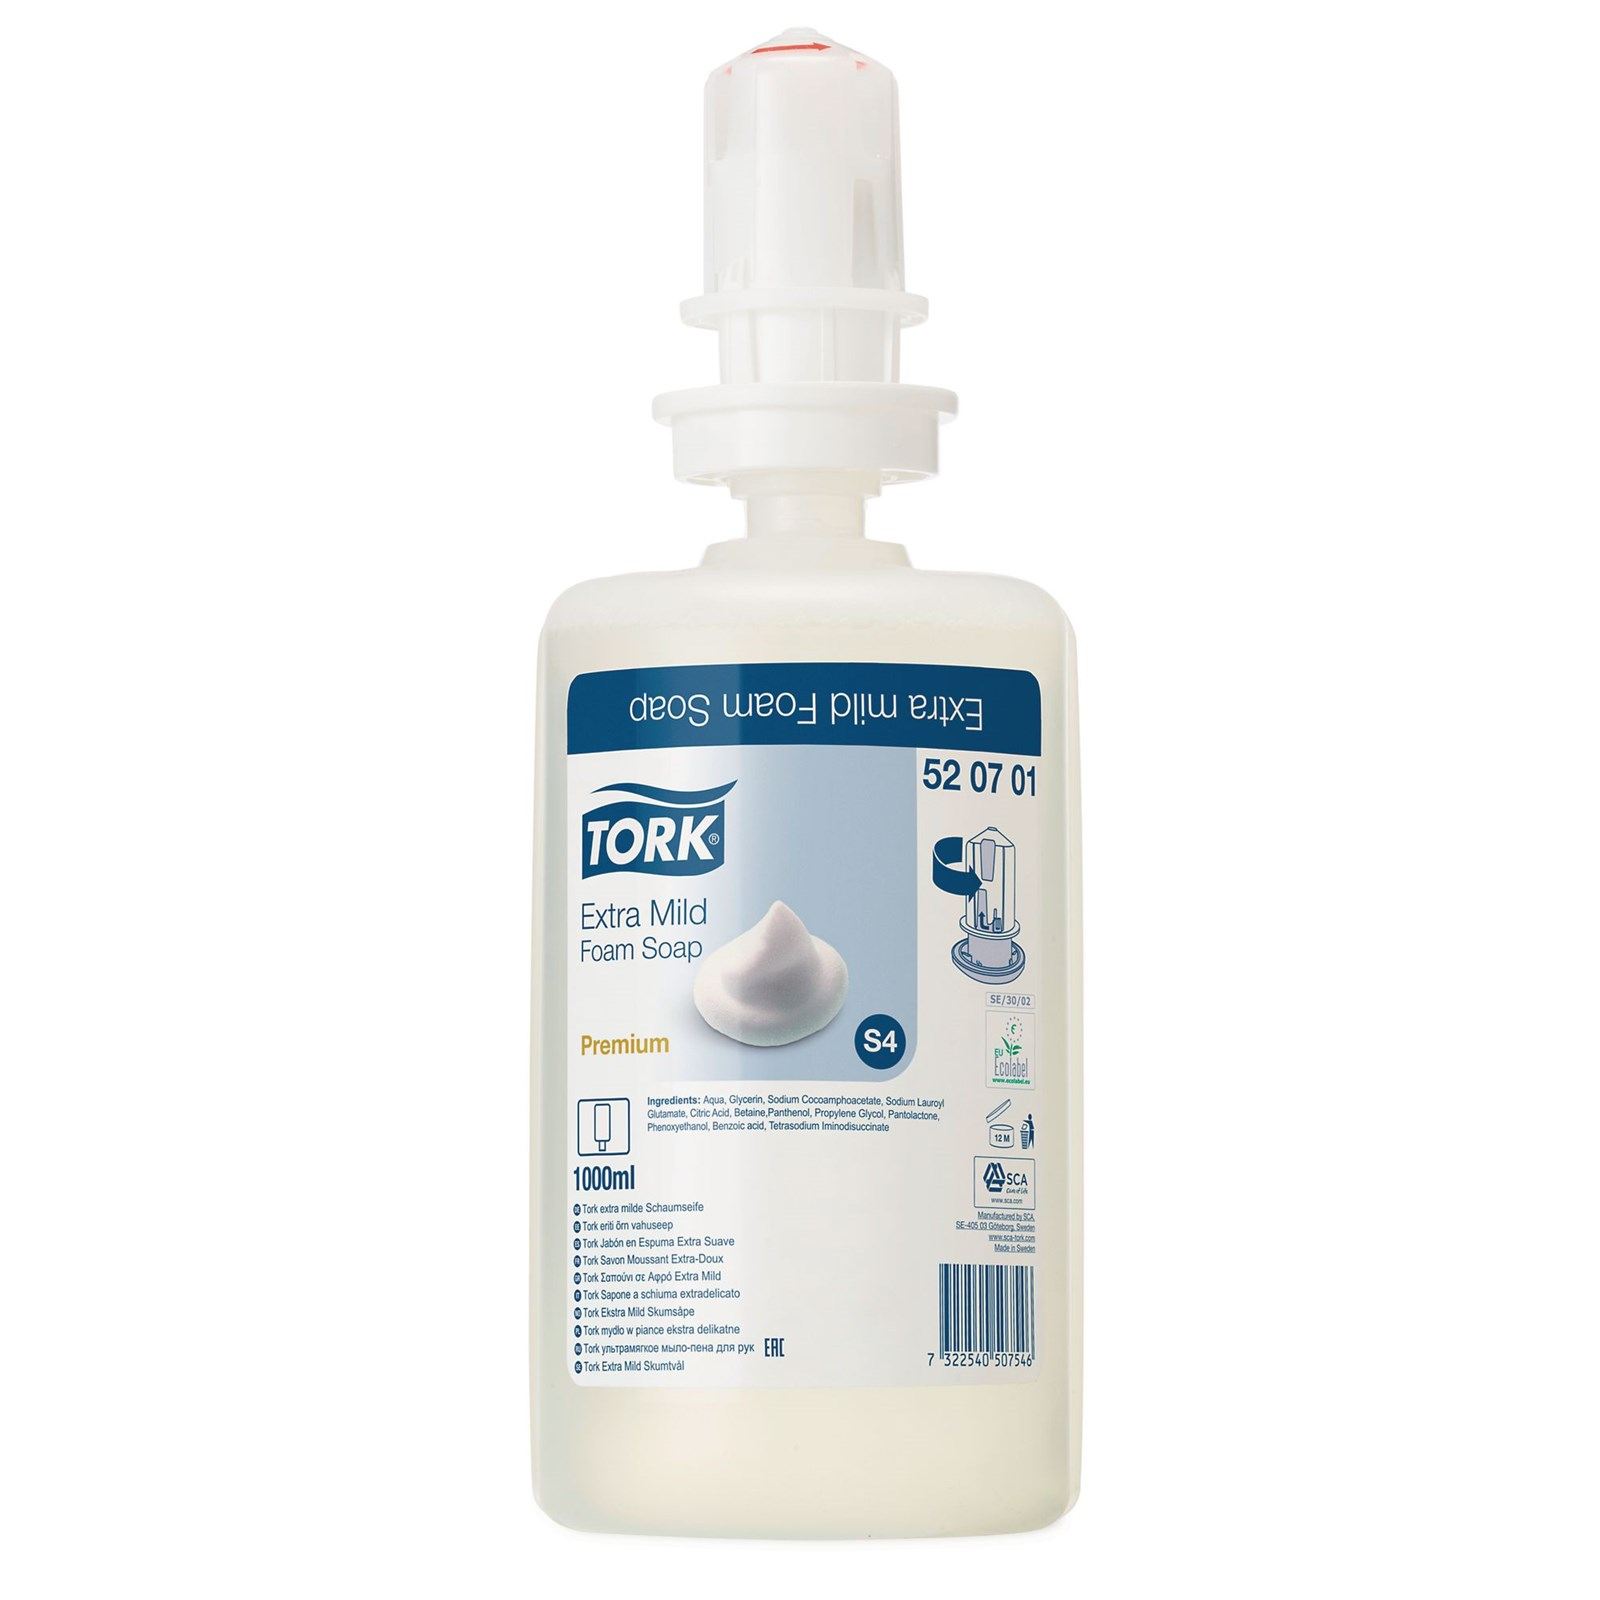 Extra Mild Foam Soap